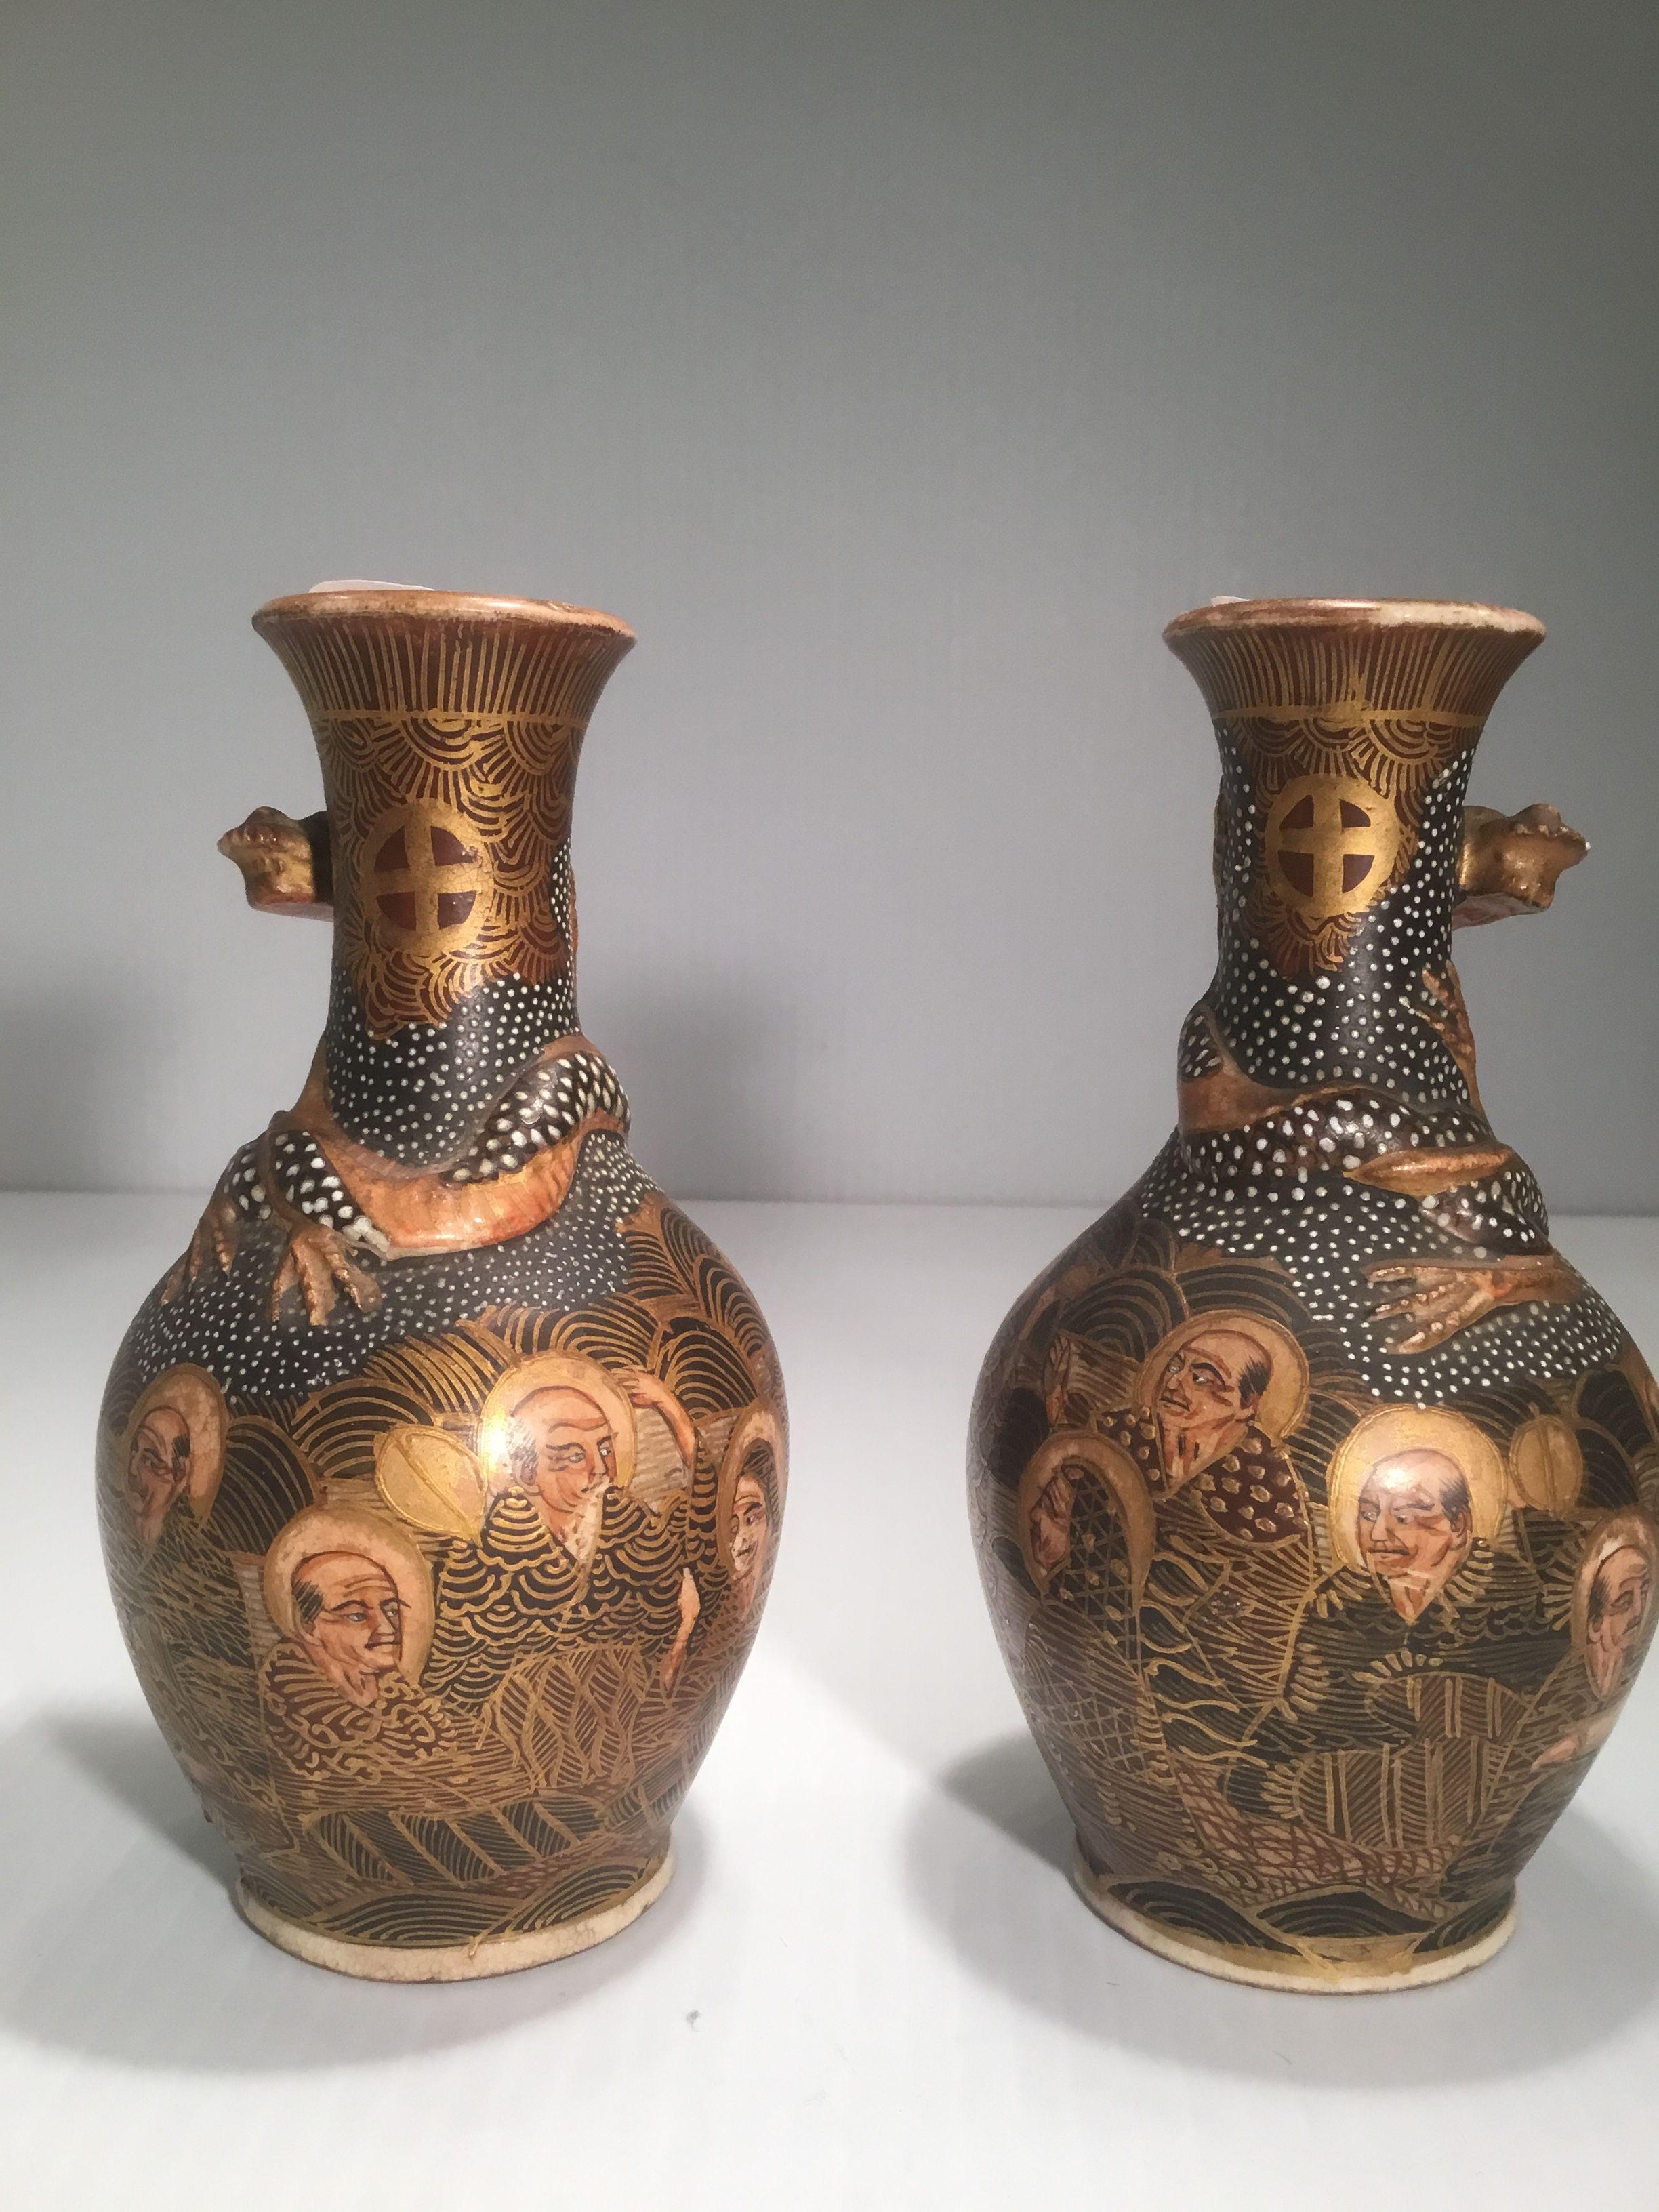 satsuma vase ebay of hododa satsuma vases pinterest ware f c in hododa